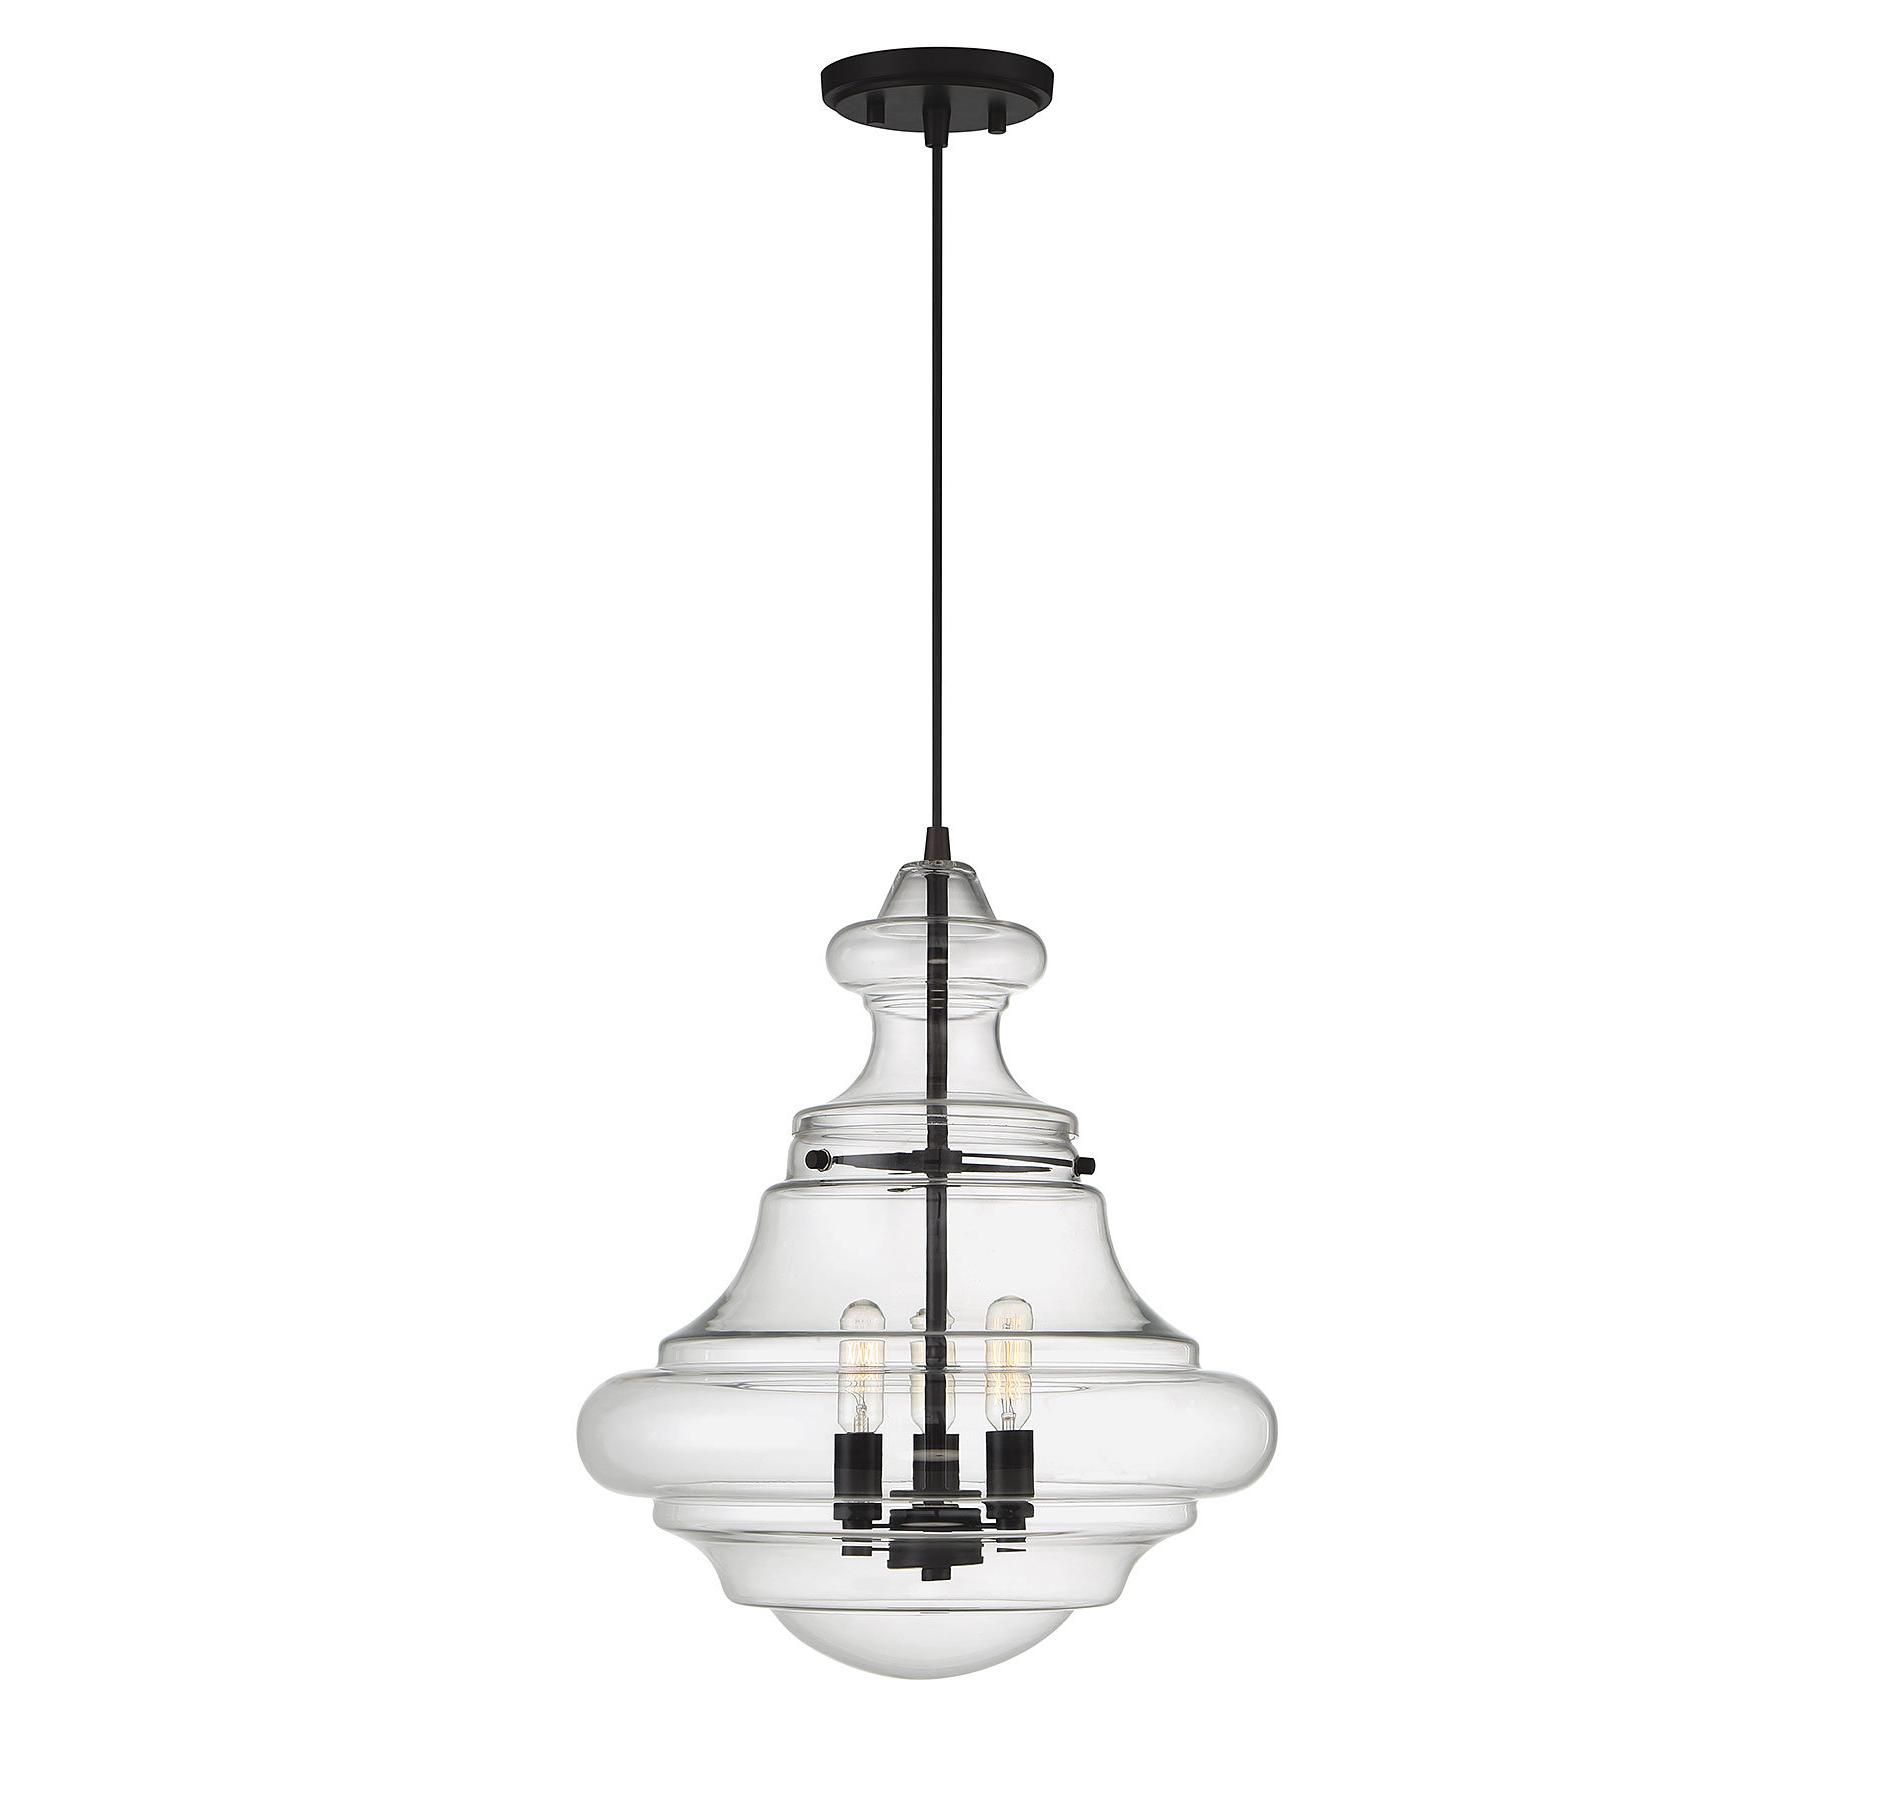 3-Light Single Urn Pendants with Fashionable Edford 3-Light Single Schoolhouse Pendant